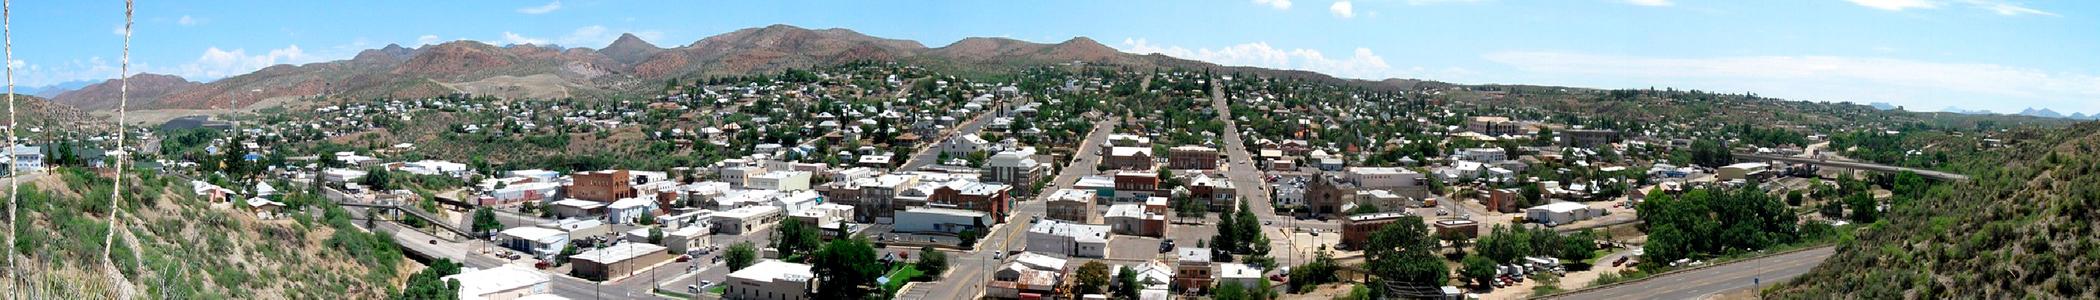 Globe Arizona Travel Guide At Wikivoyage